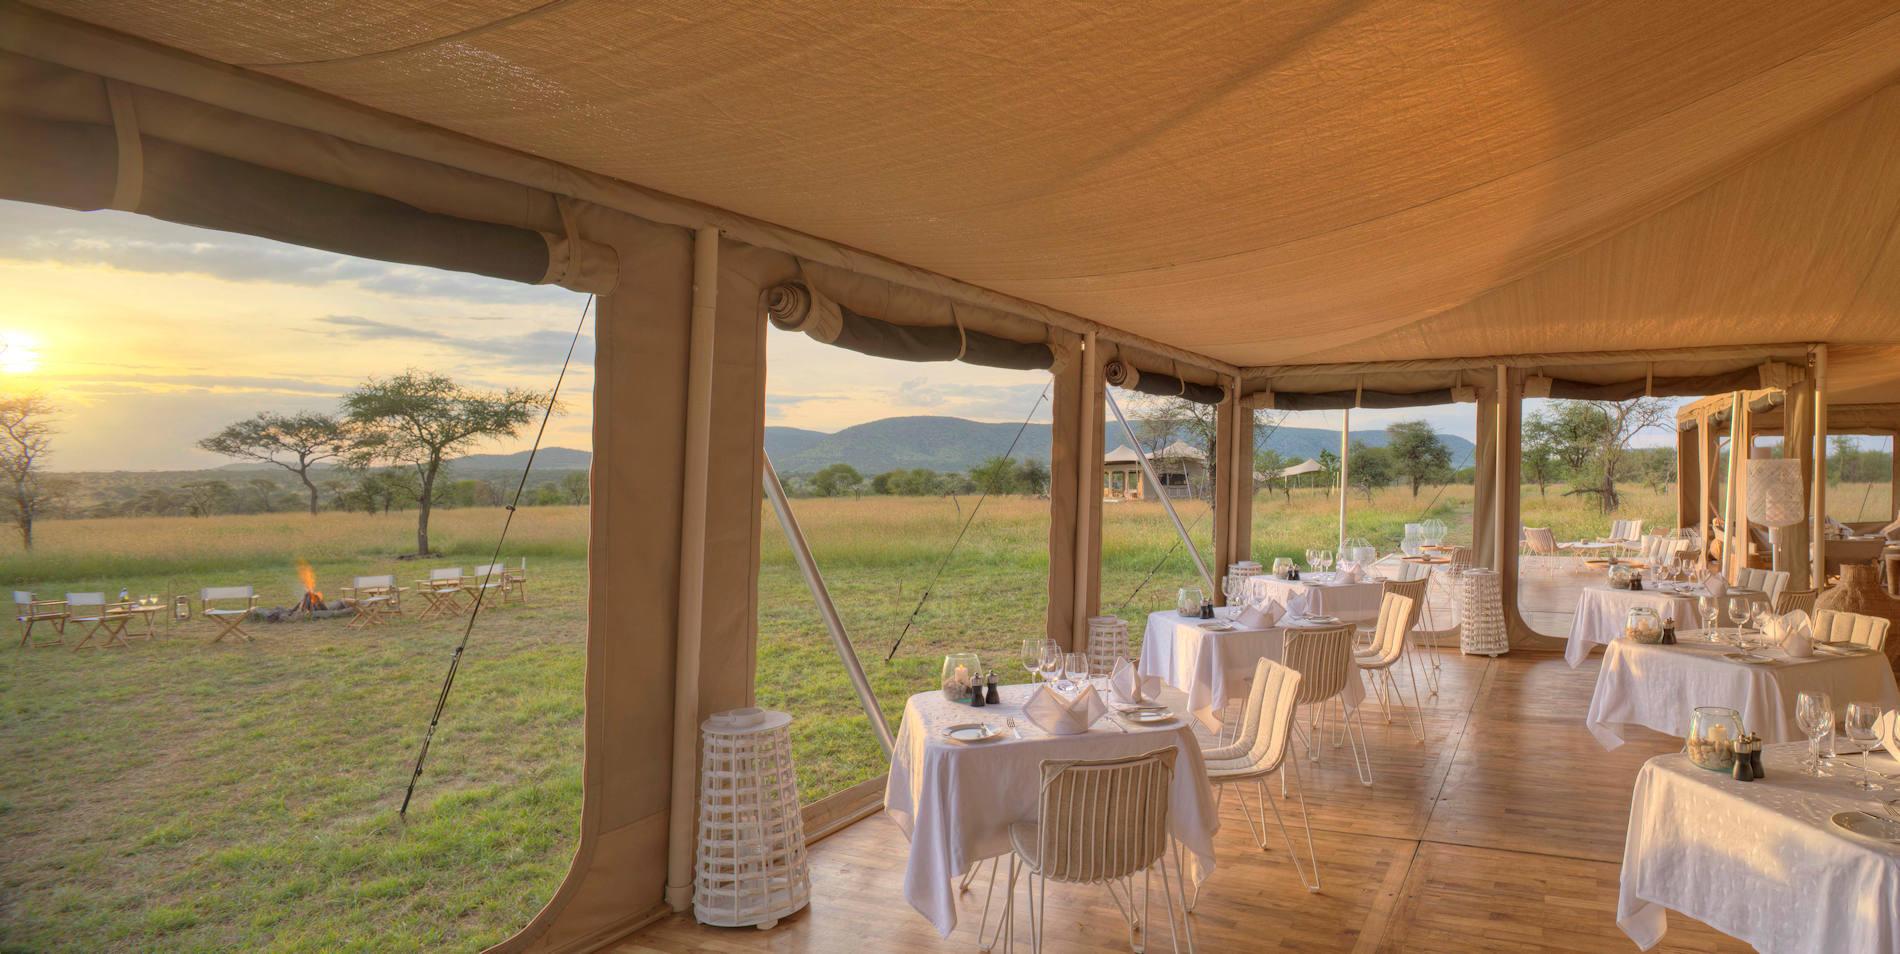 Terrasse, Roving Bushtops Serengeti, Tansania